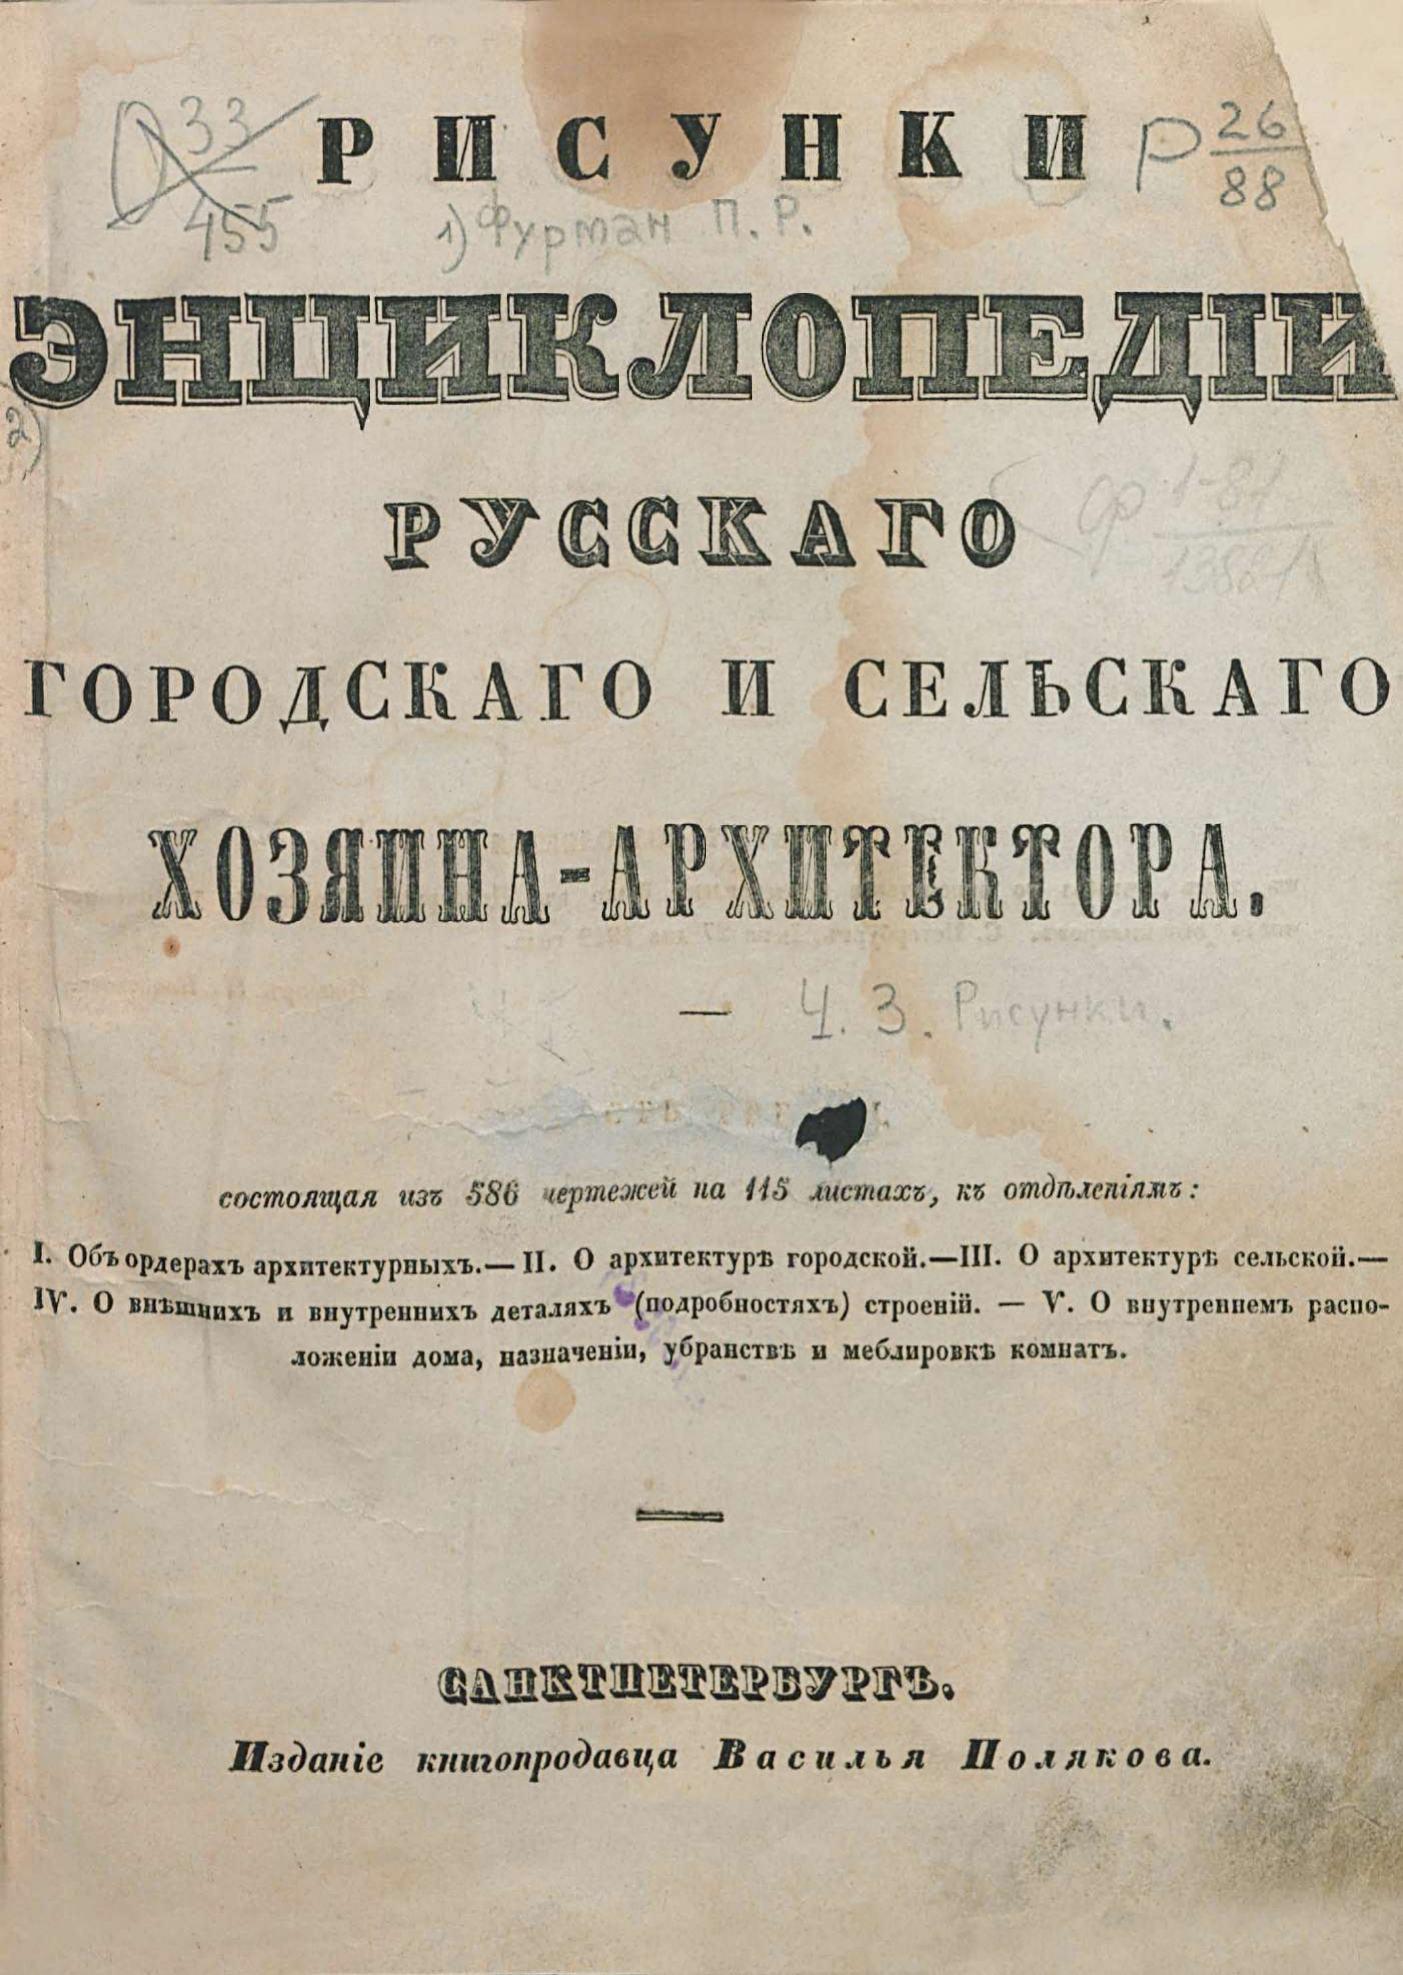 furmann-entciclopediia-russkogo-gorodskogo-i-selskogo-hoziaina-arhitektora-ch3-1842_Page5.jpg